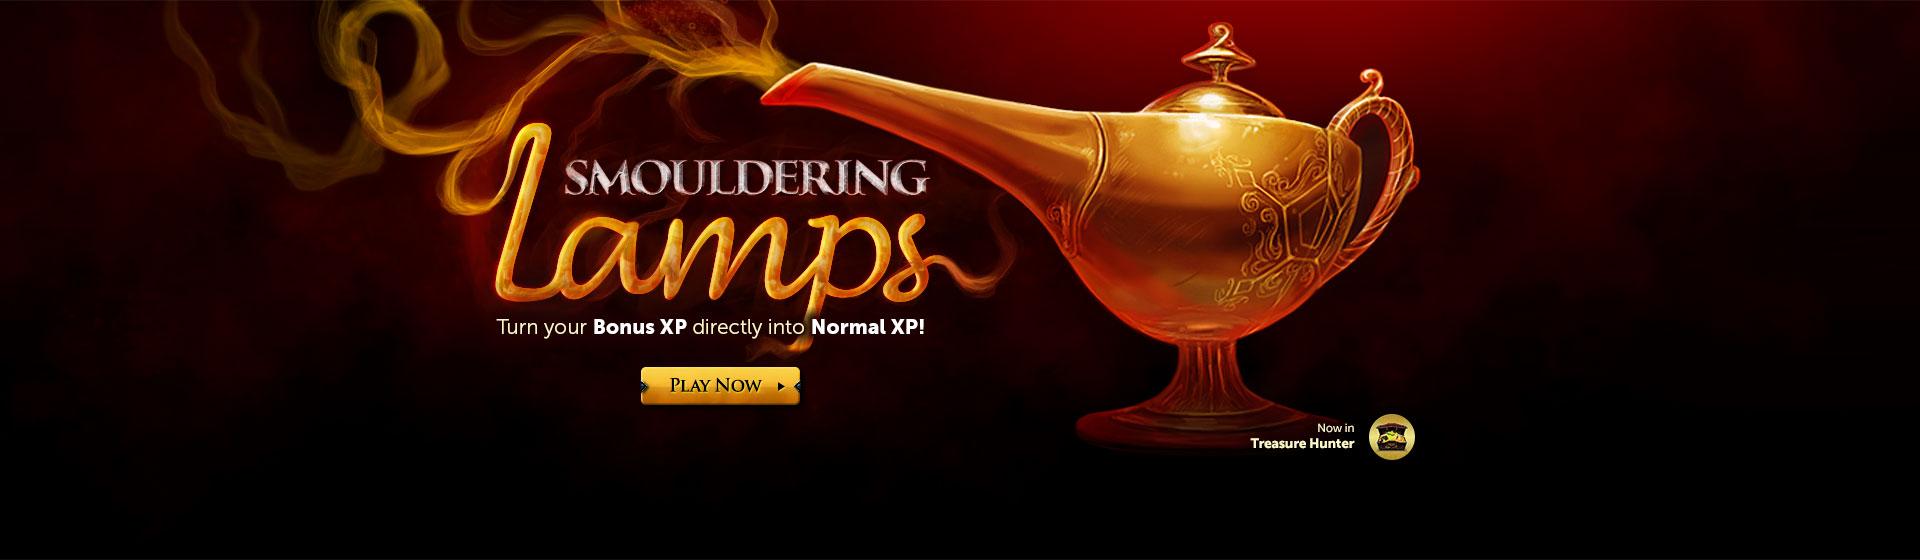 Image - Smouldering lamps head banner.jpg | RuneScape Wiki ...